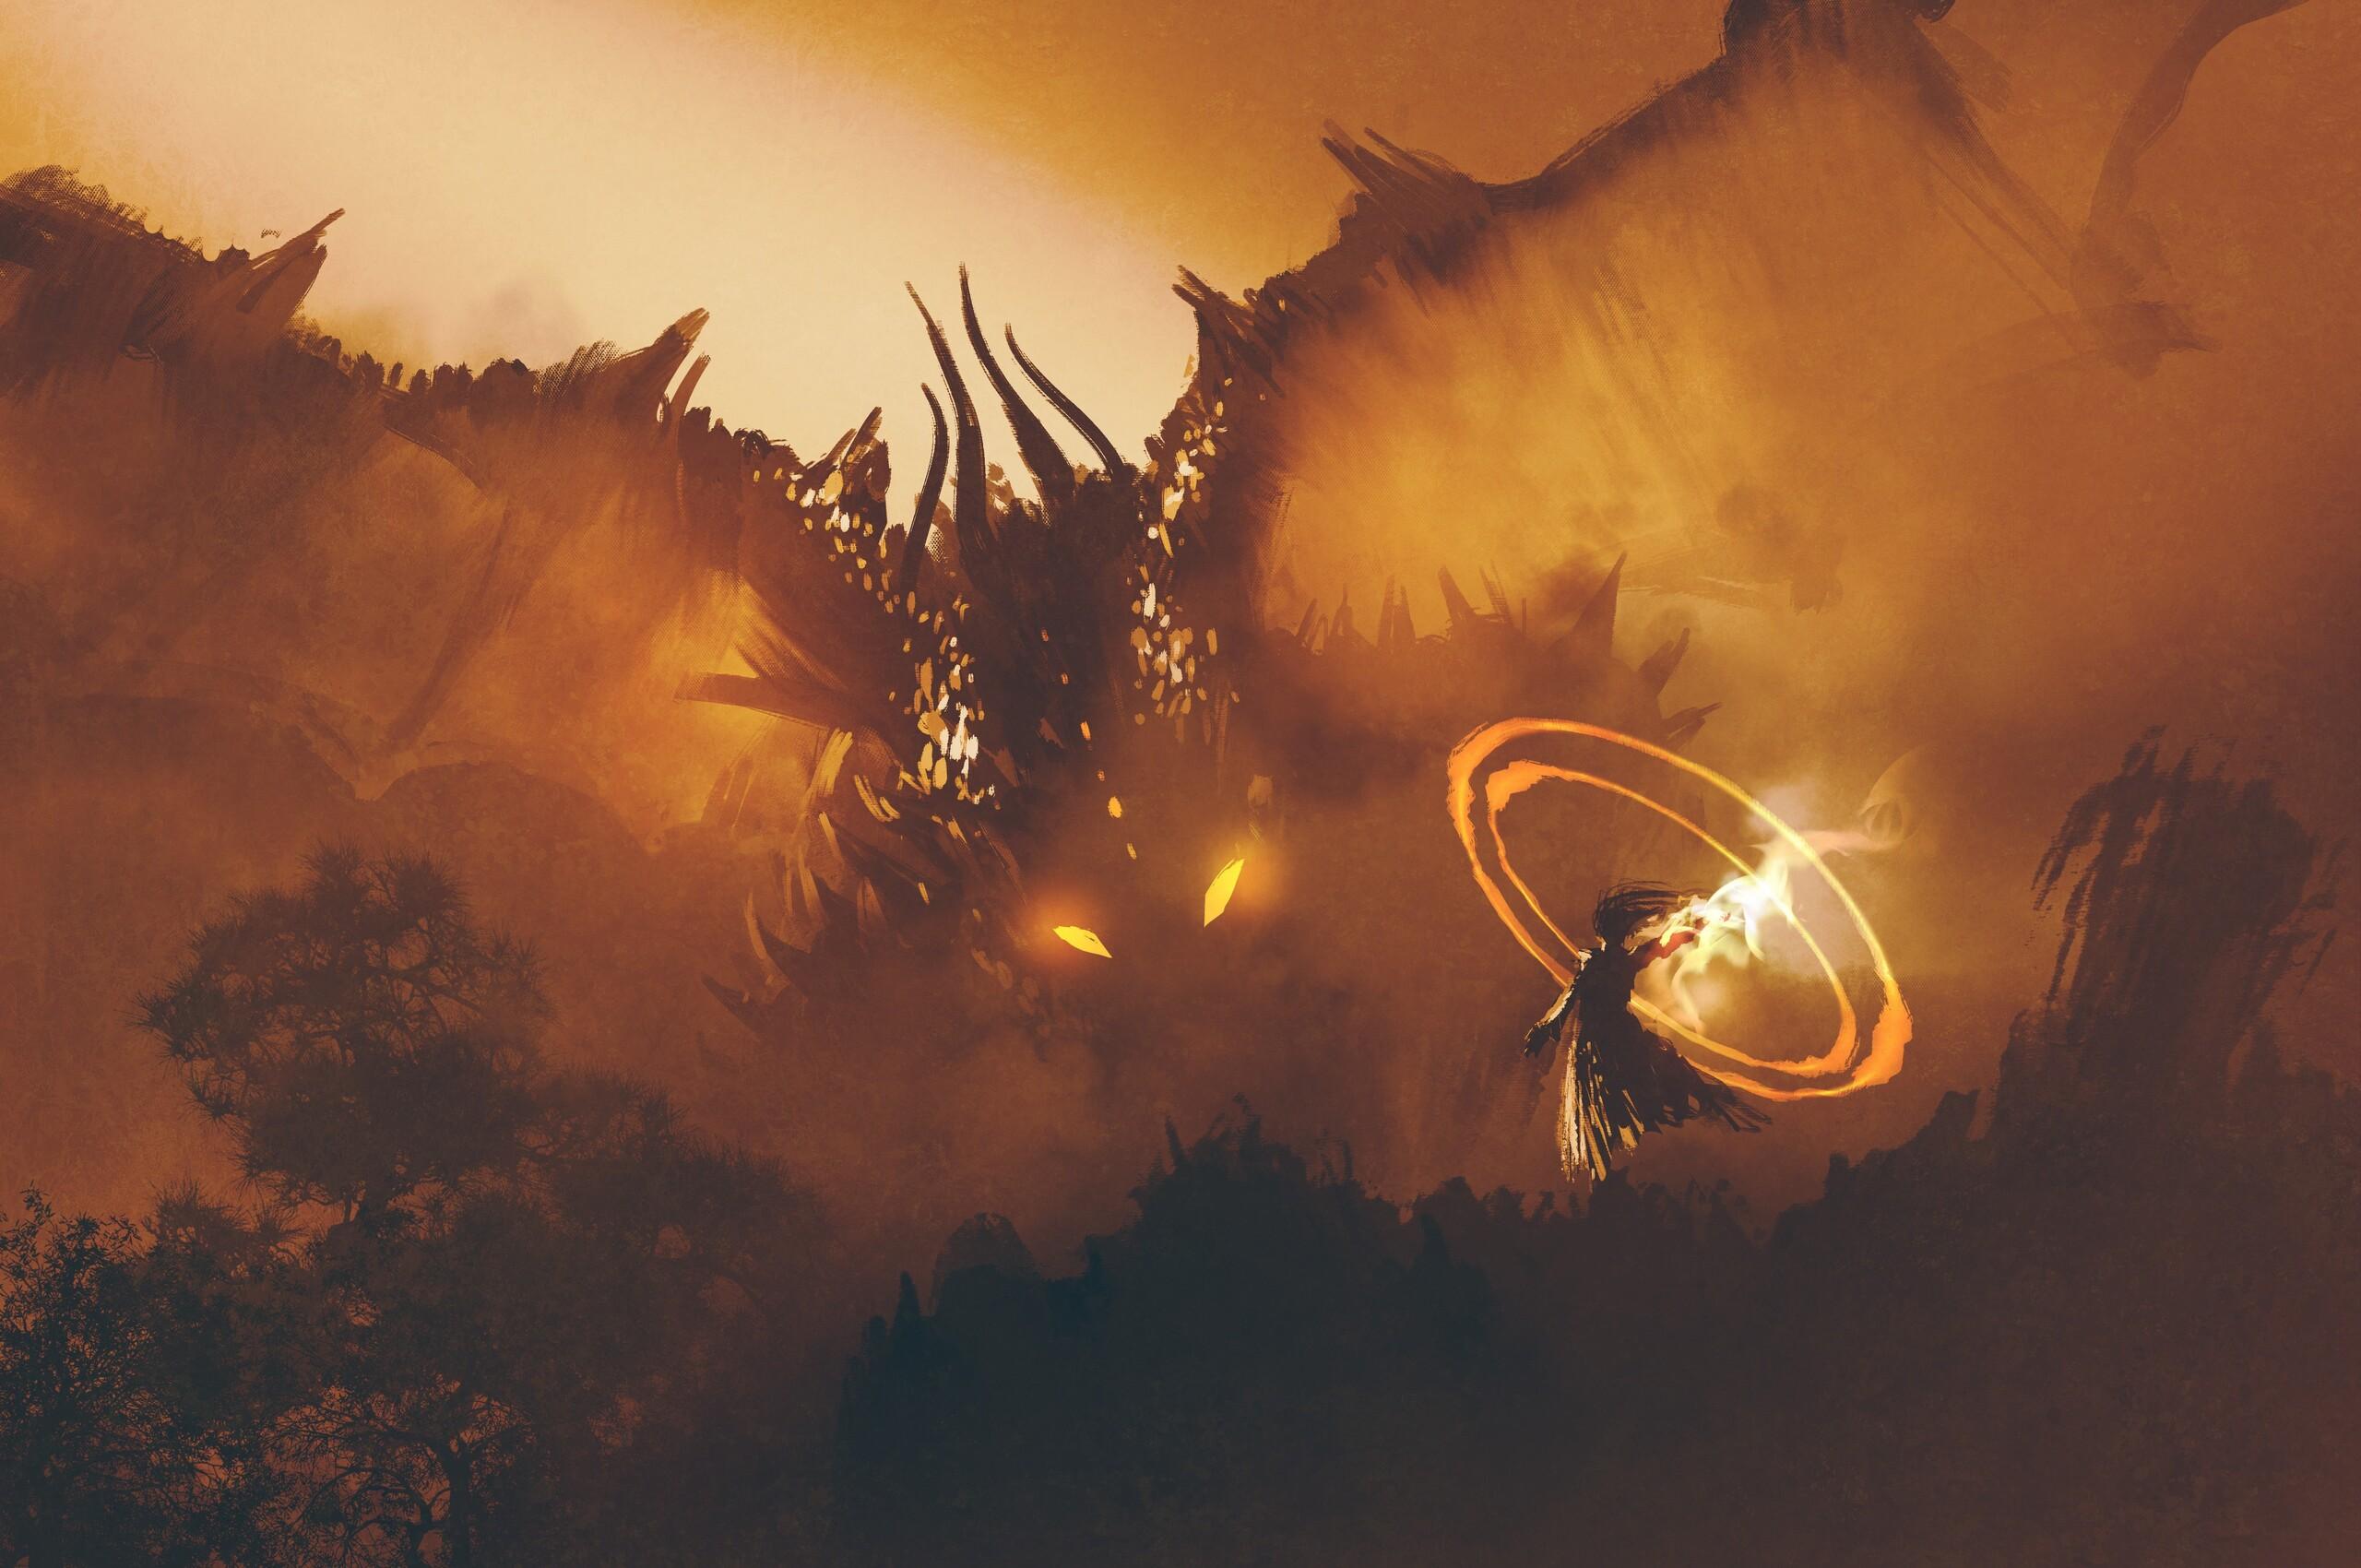 artwork-colorful-dragon-wizard-hn.jpg